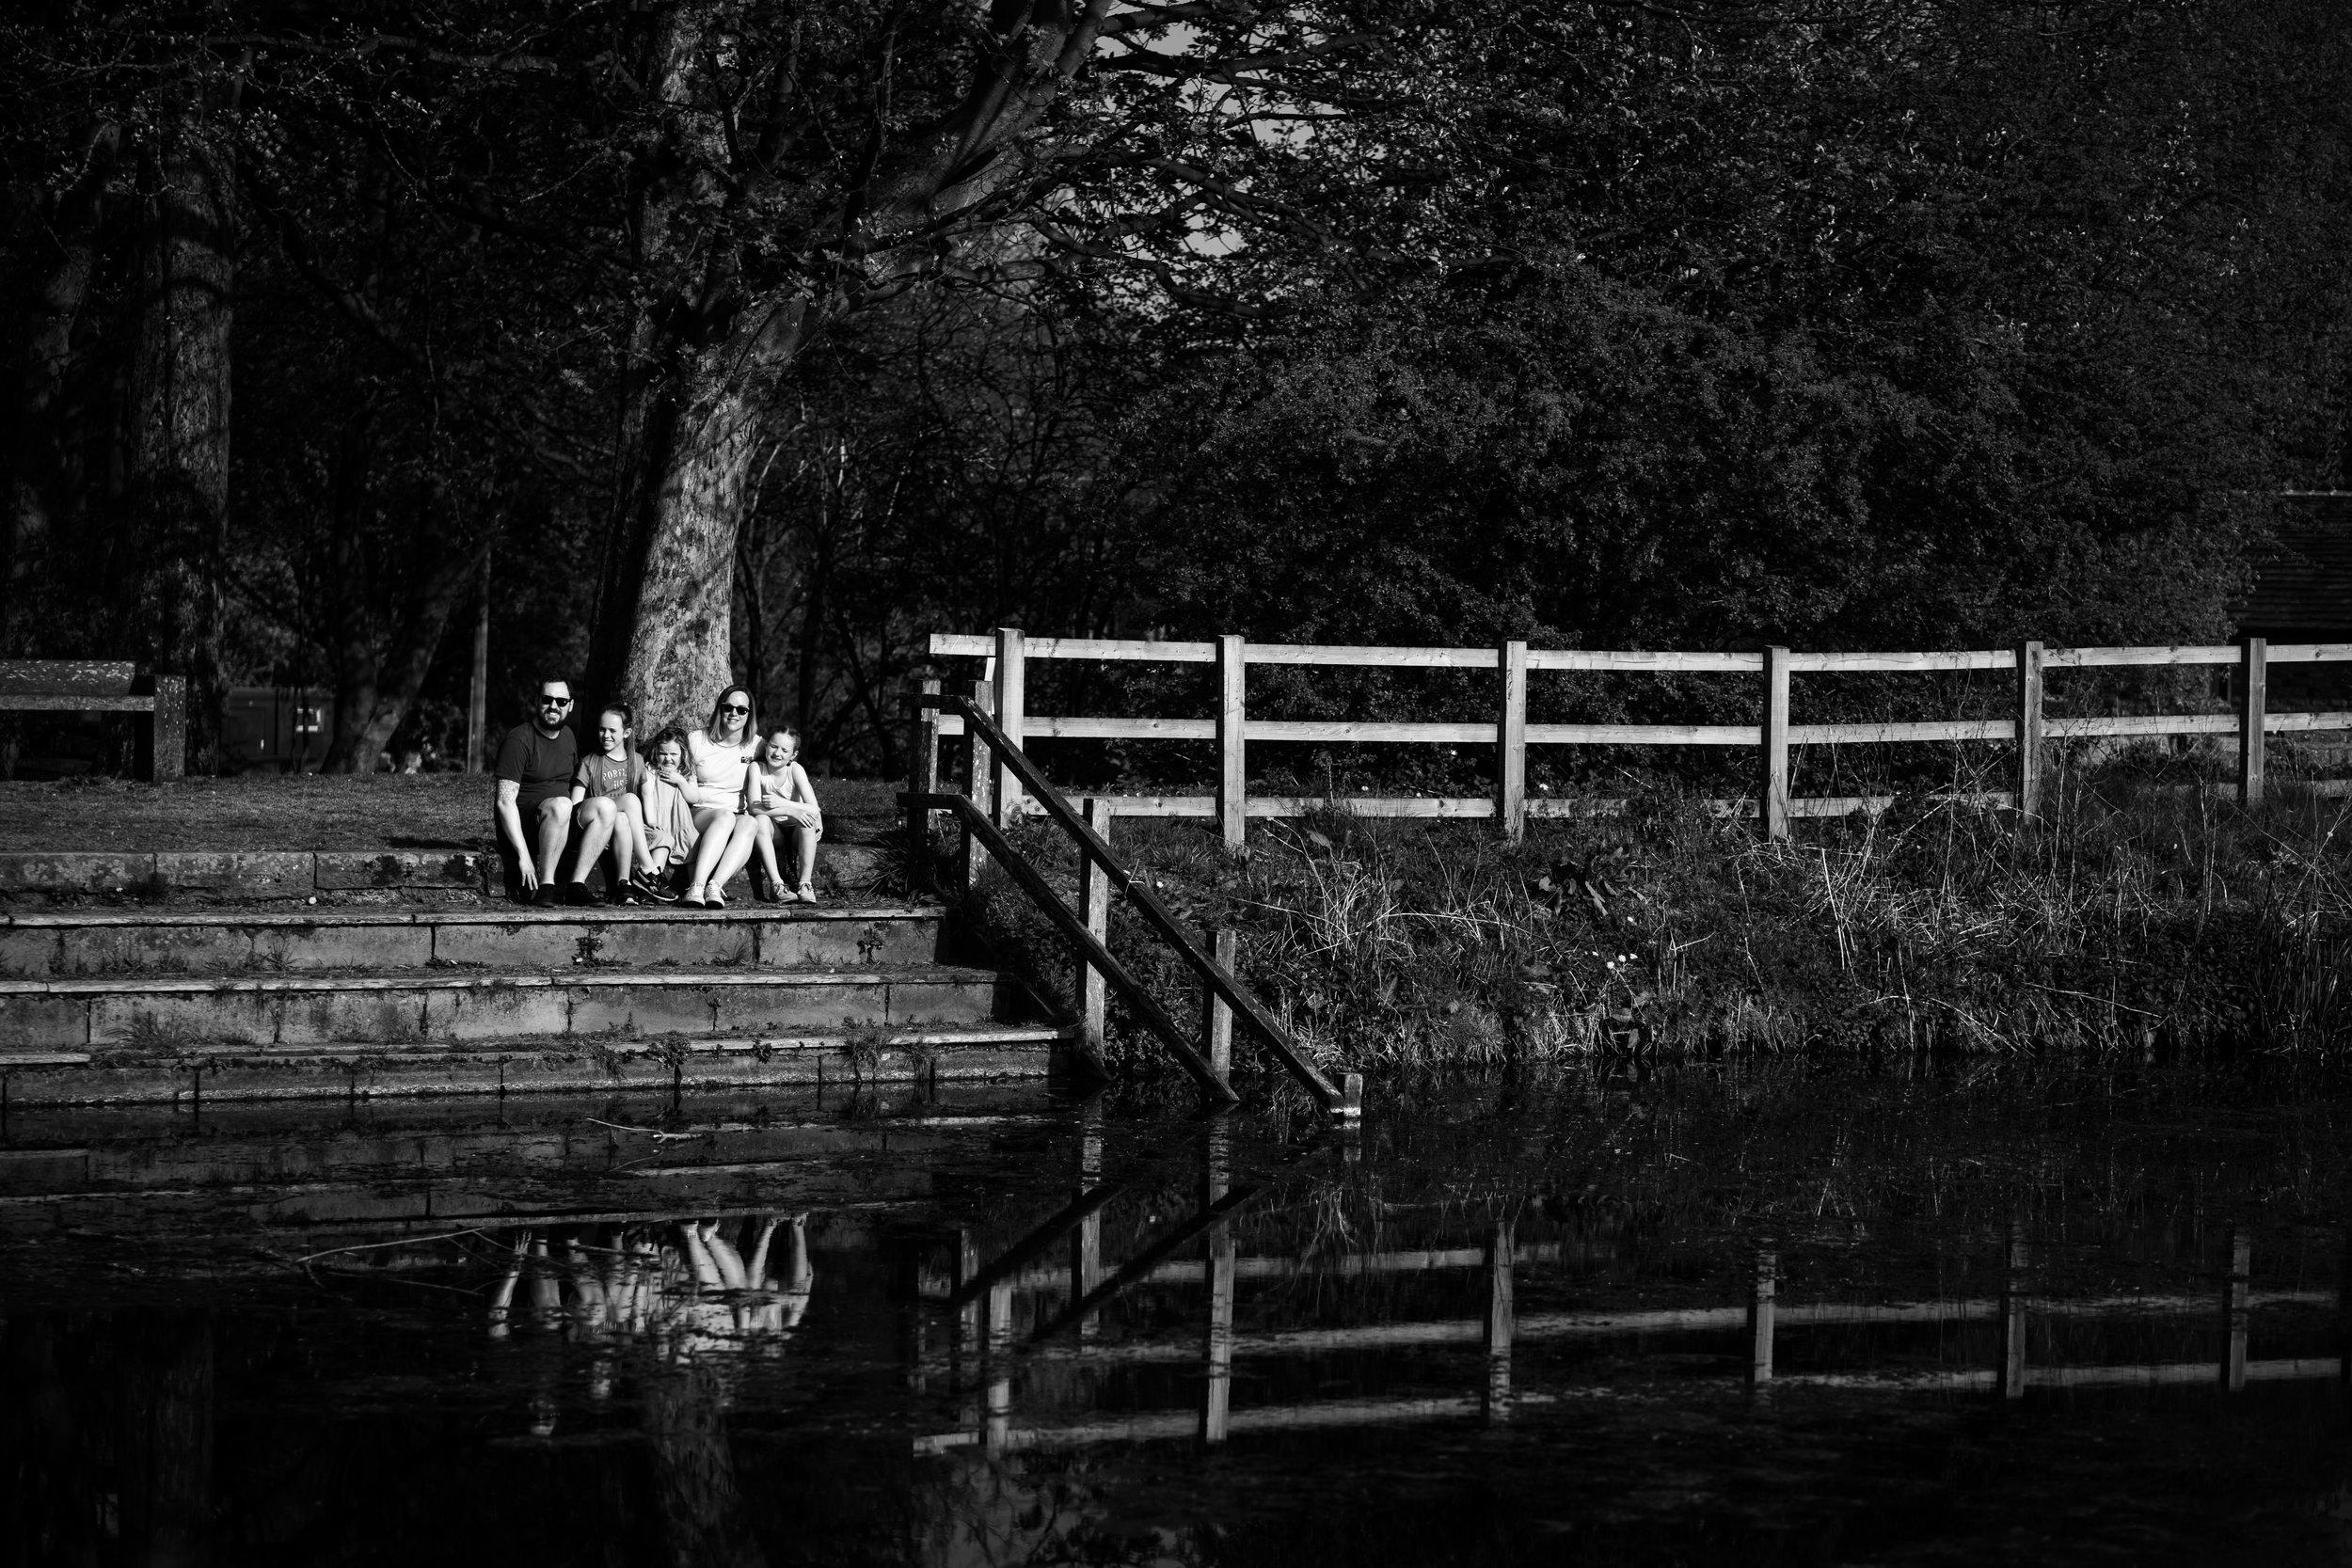 burrs country park family 2547.jpg